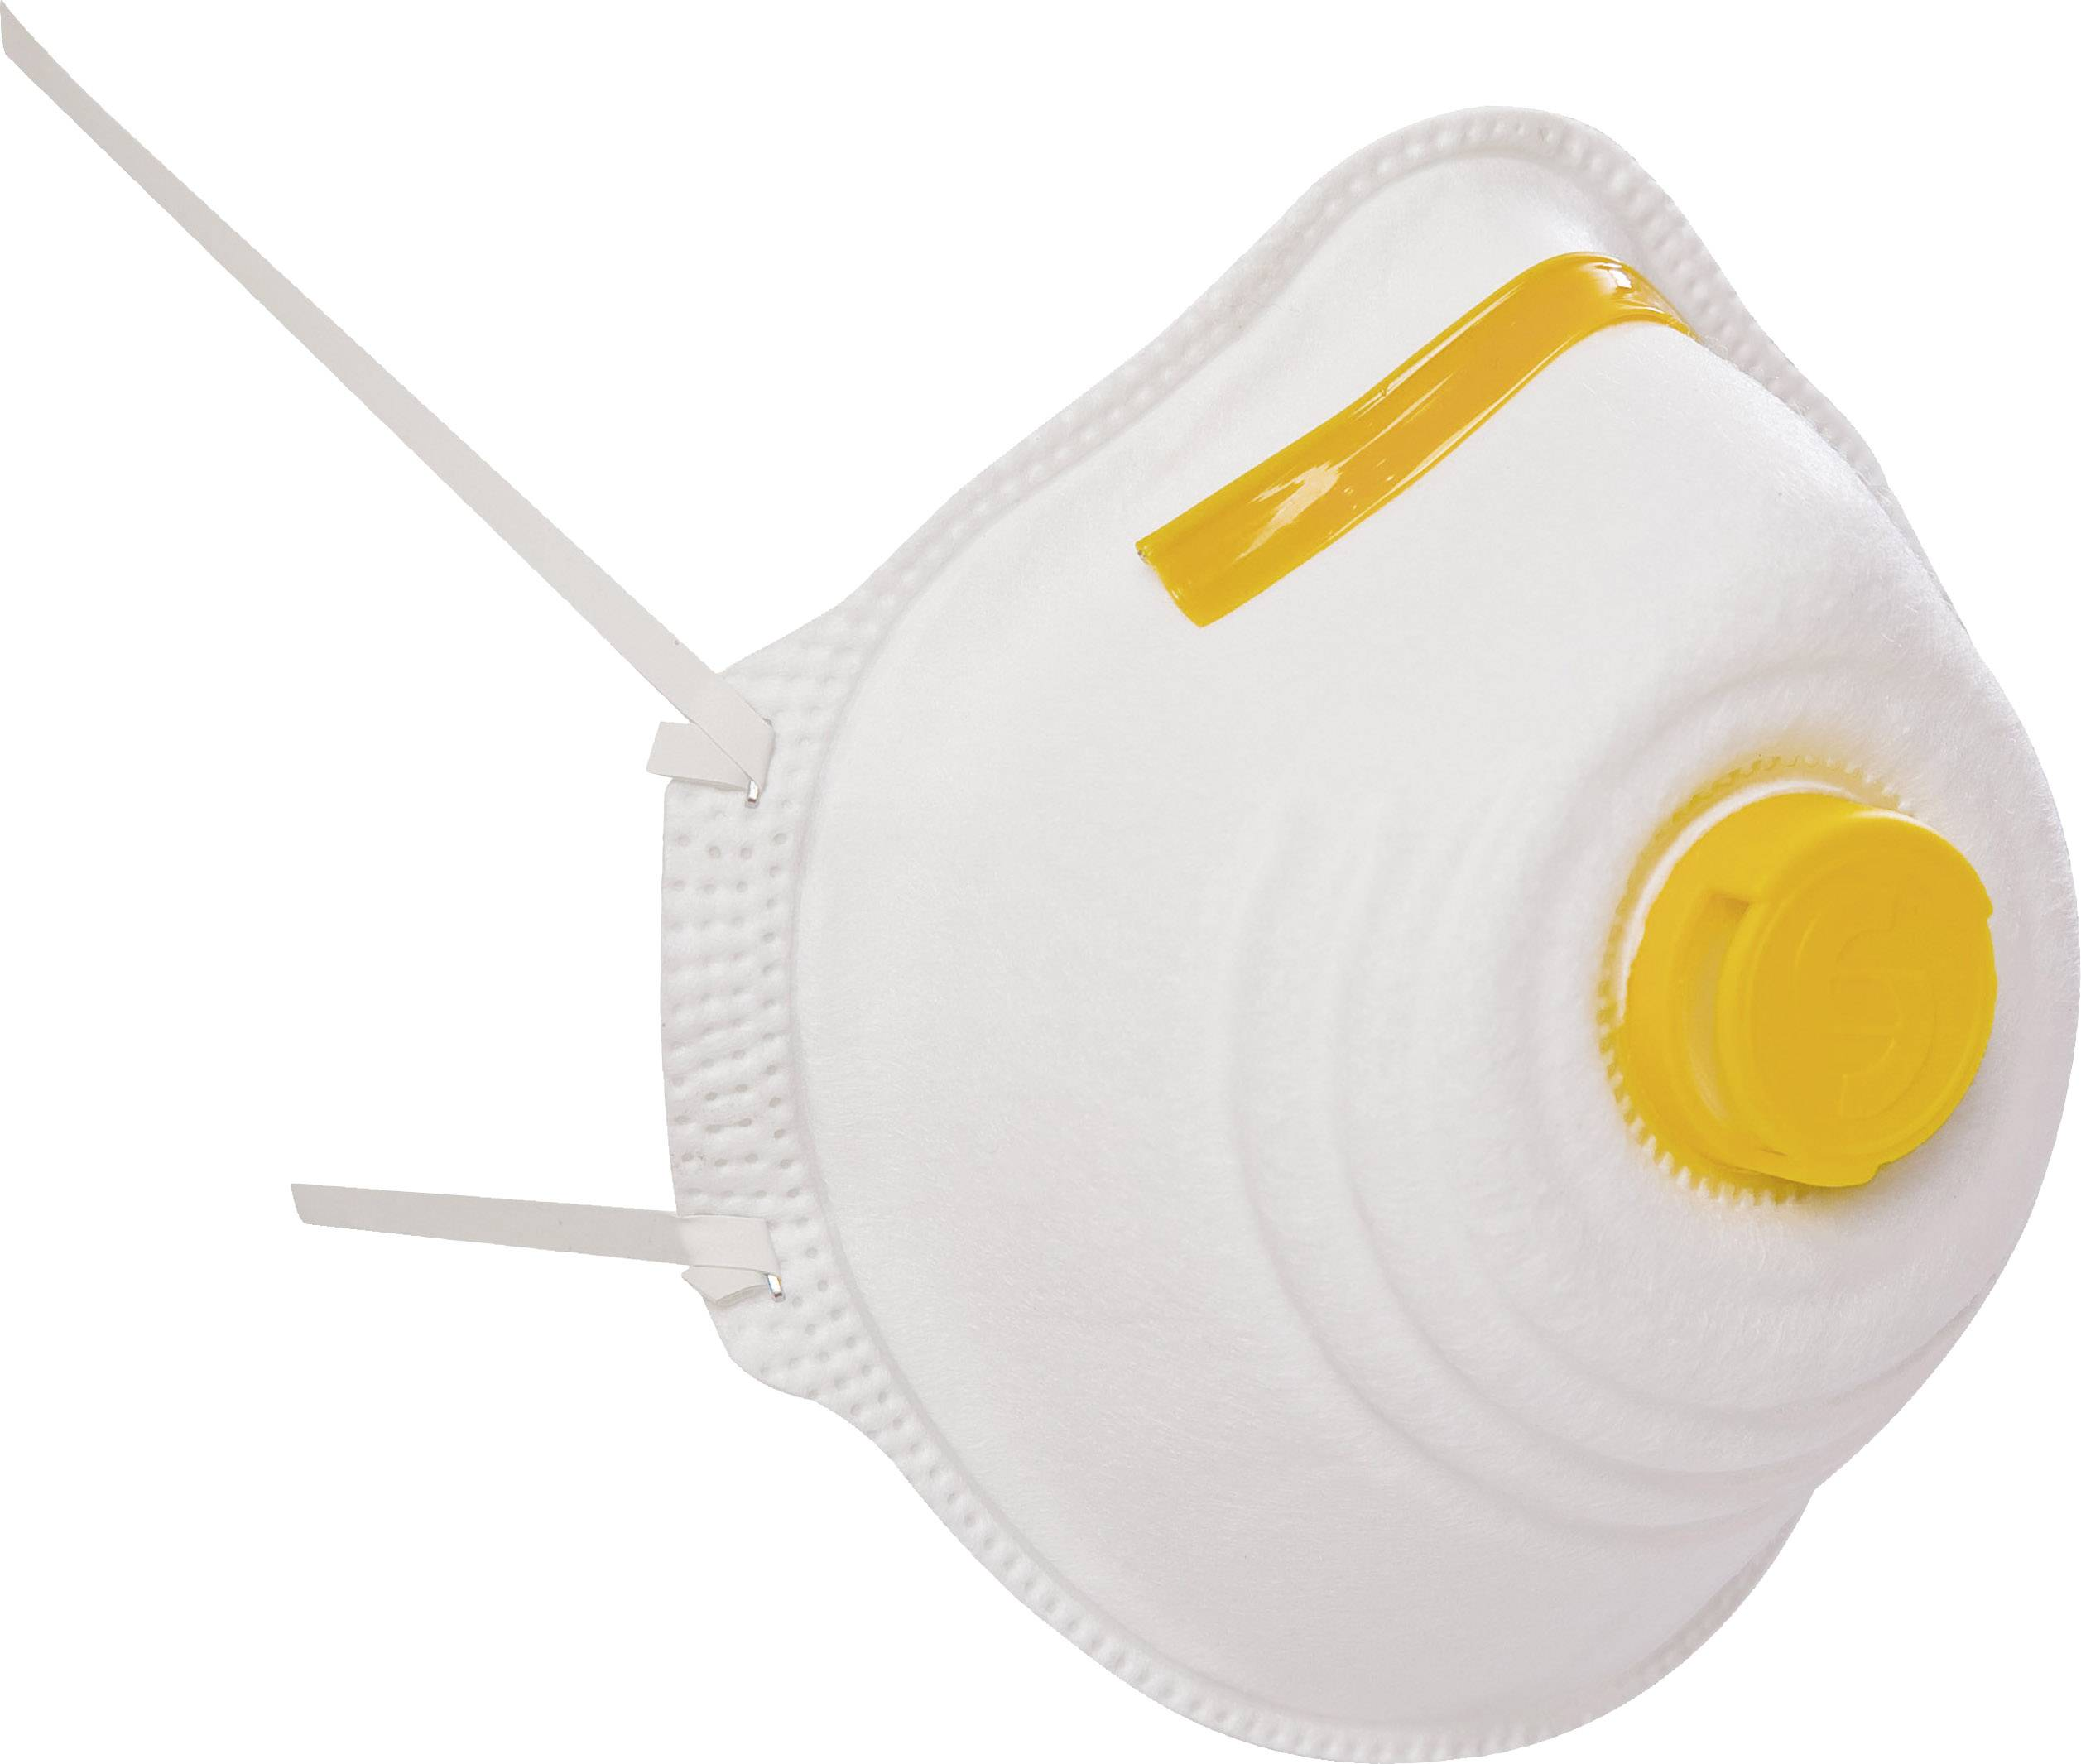 Respirátor proti jemnému prachu, s ventilem EKASTU Sekur 411 381, třída filtrace FFP1, 12 ks